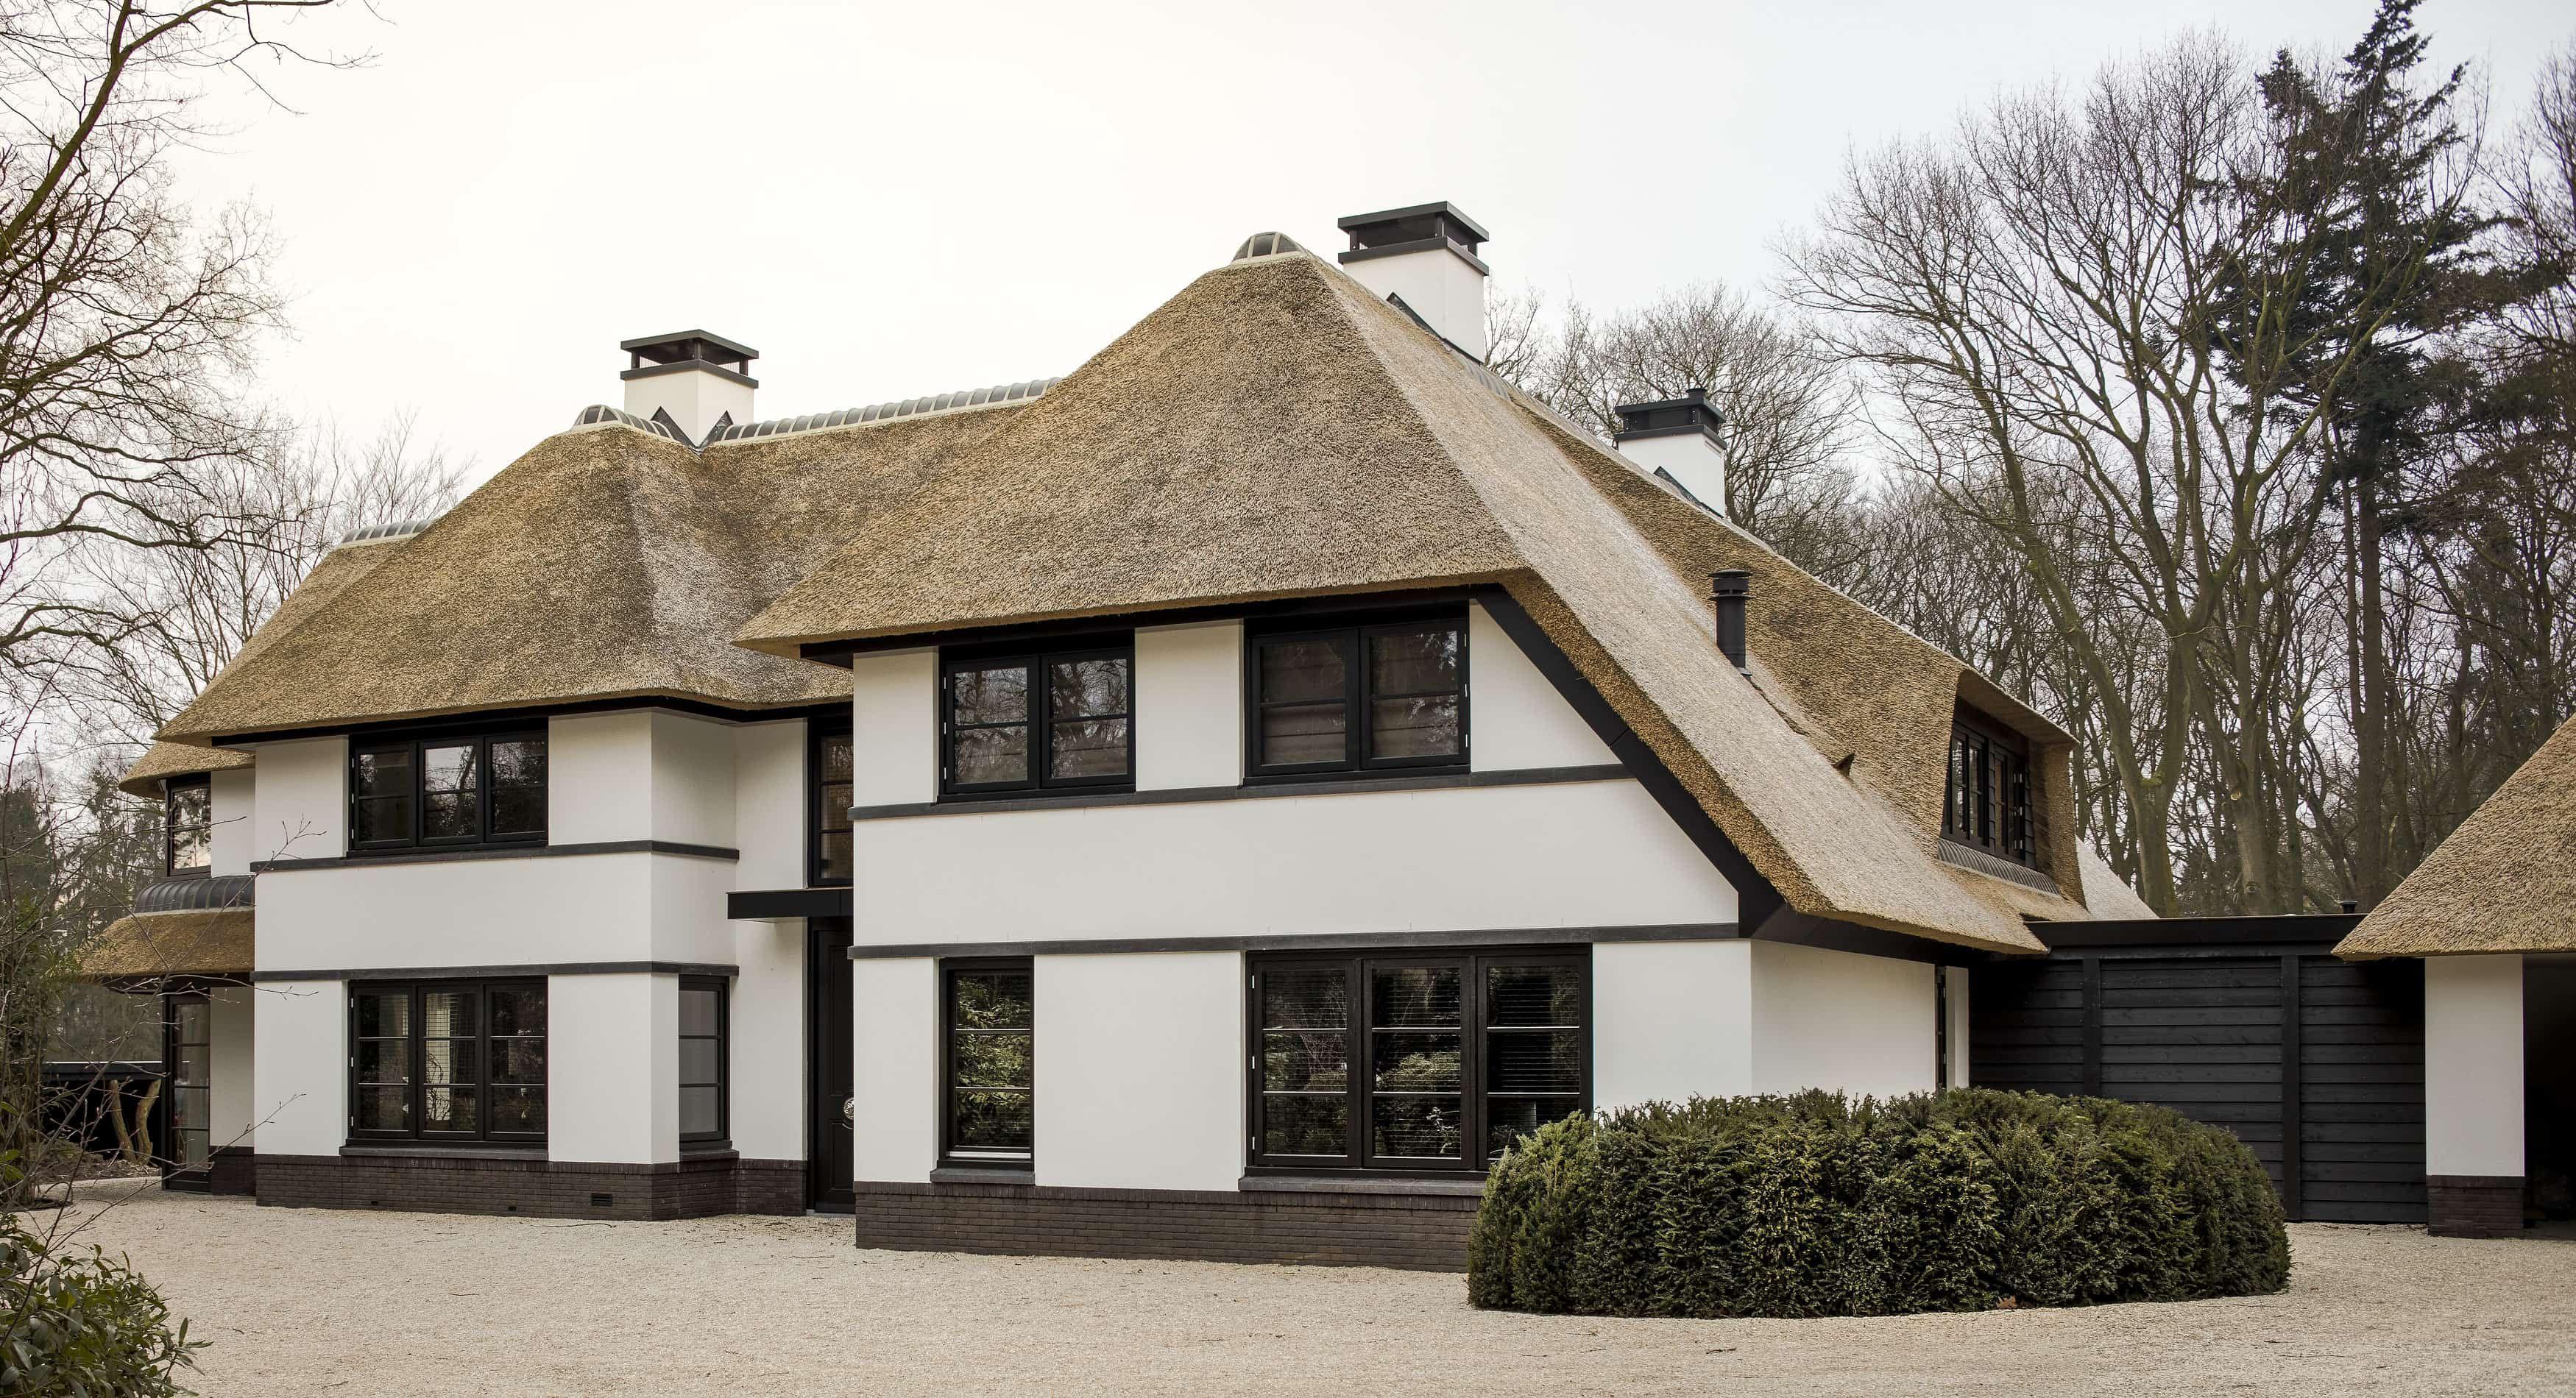 Kabaz het bekende gooise interieur architectenbureau for Interieur huizen